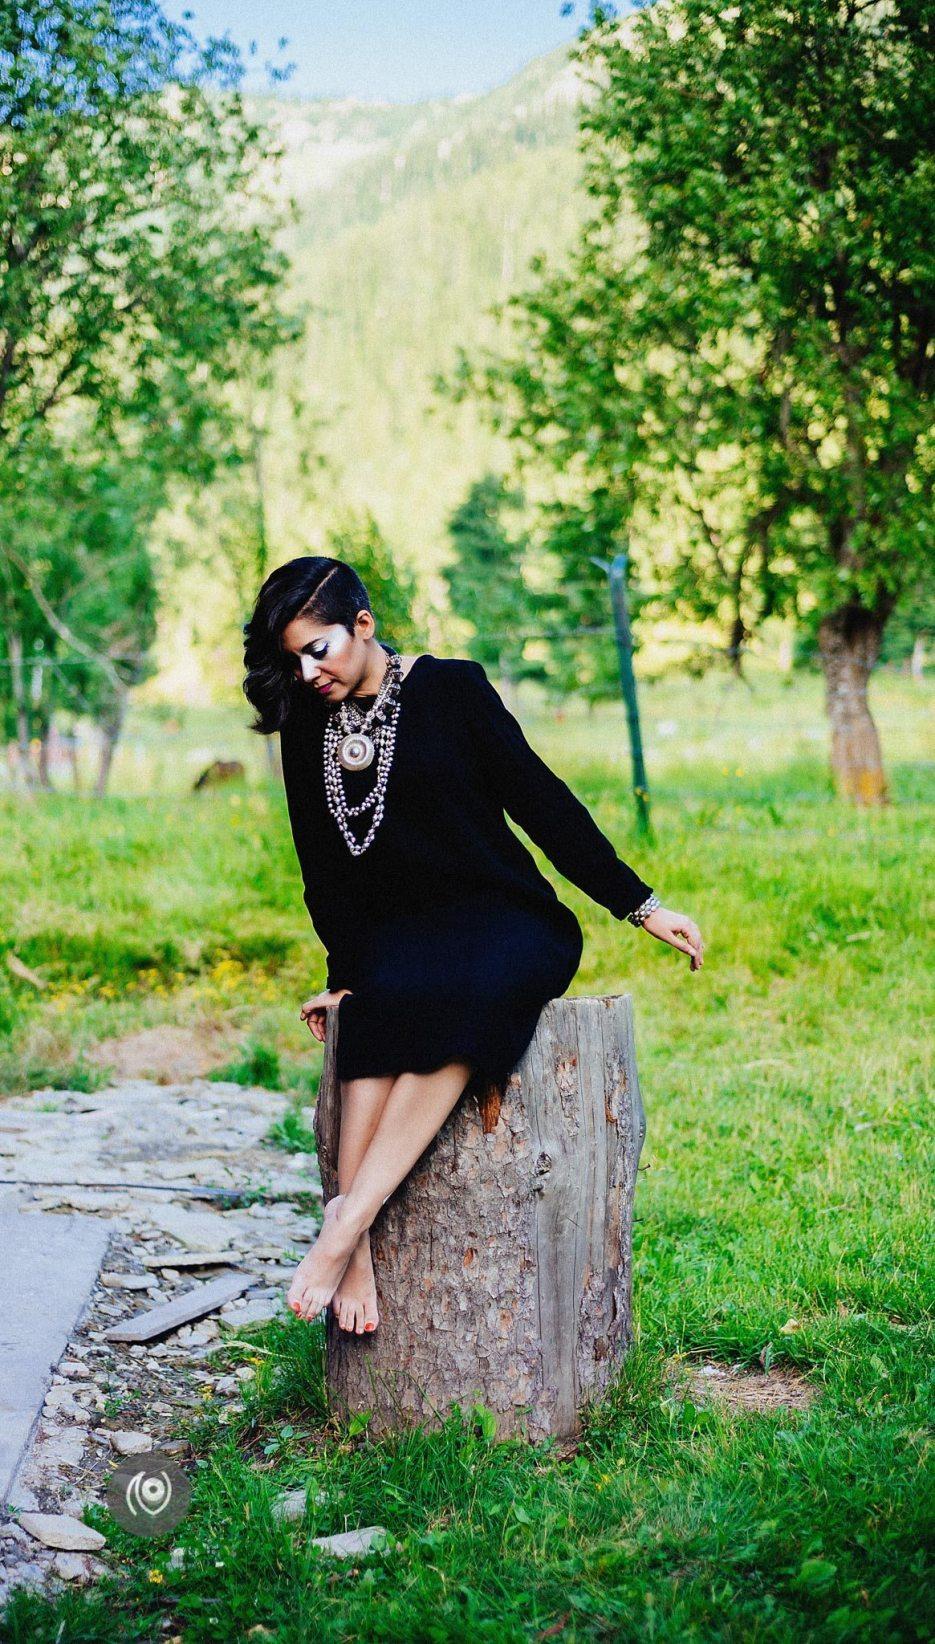 #CoverUp 47, Silver in Kashmir, EyesForDestinations, EyesForBeauty, Chanel, Naina.co Luxury & Lifestyle, Photographer Storyteller, Blogger.